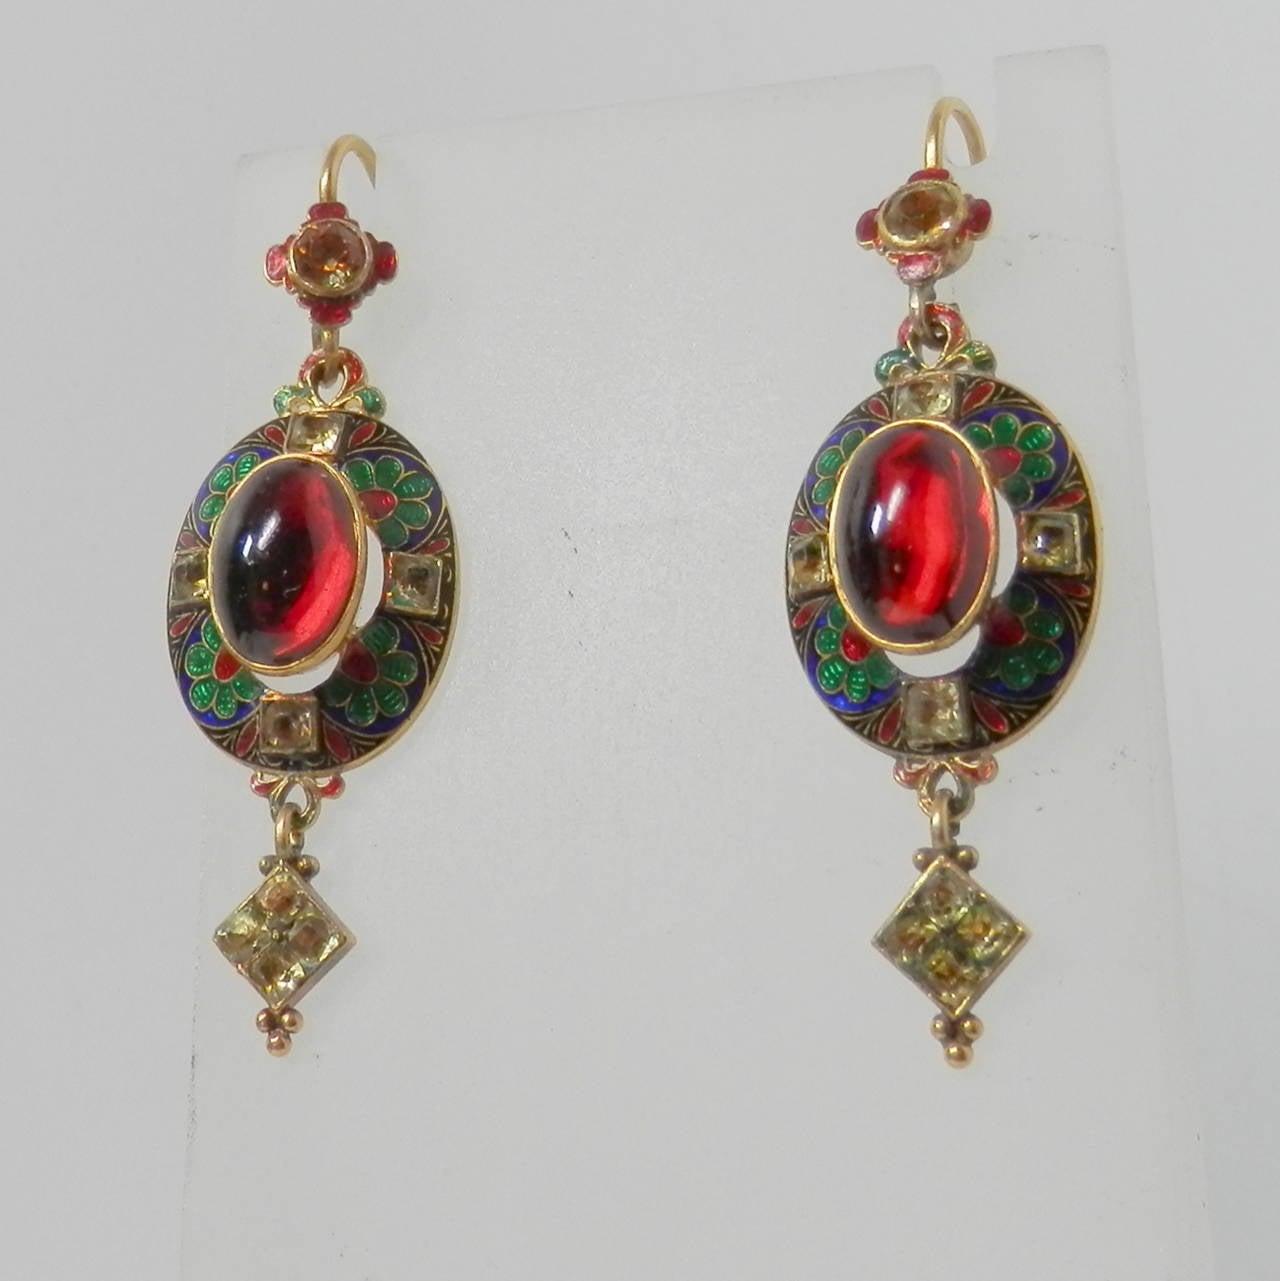 High Victorian Renaissance revival pendant  earrings For Sale